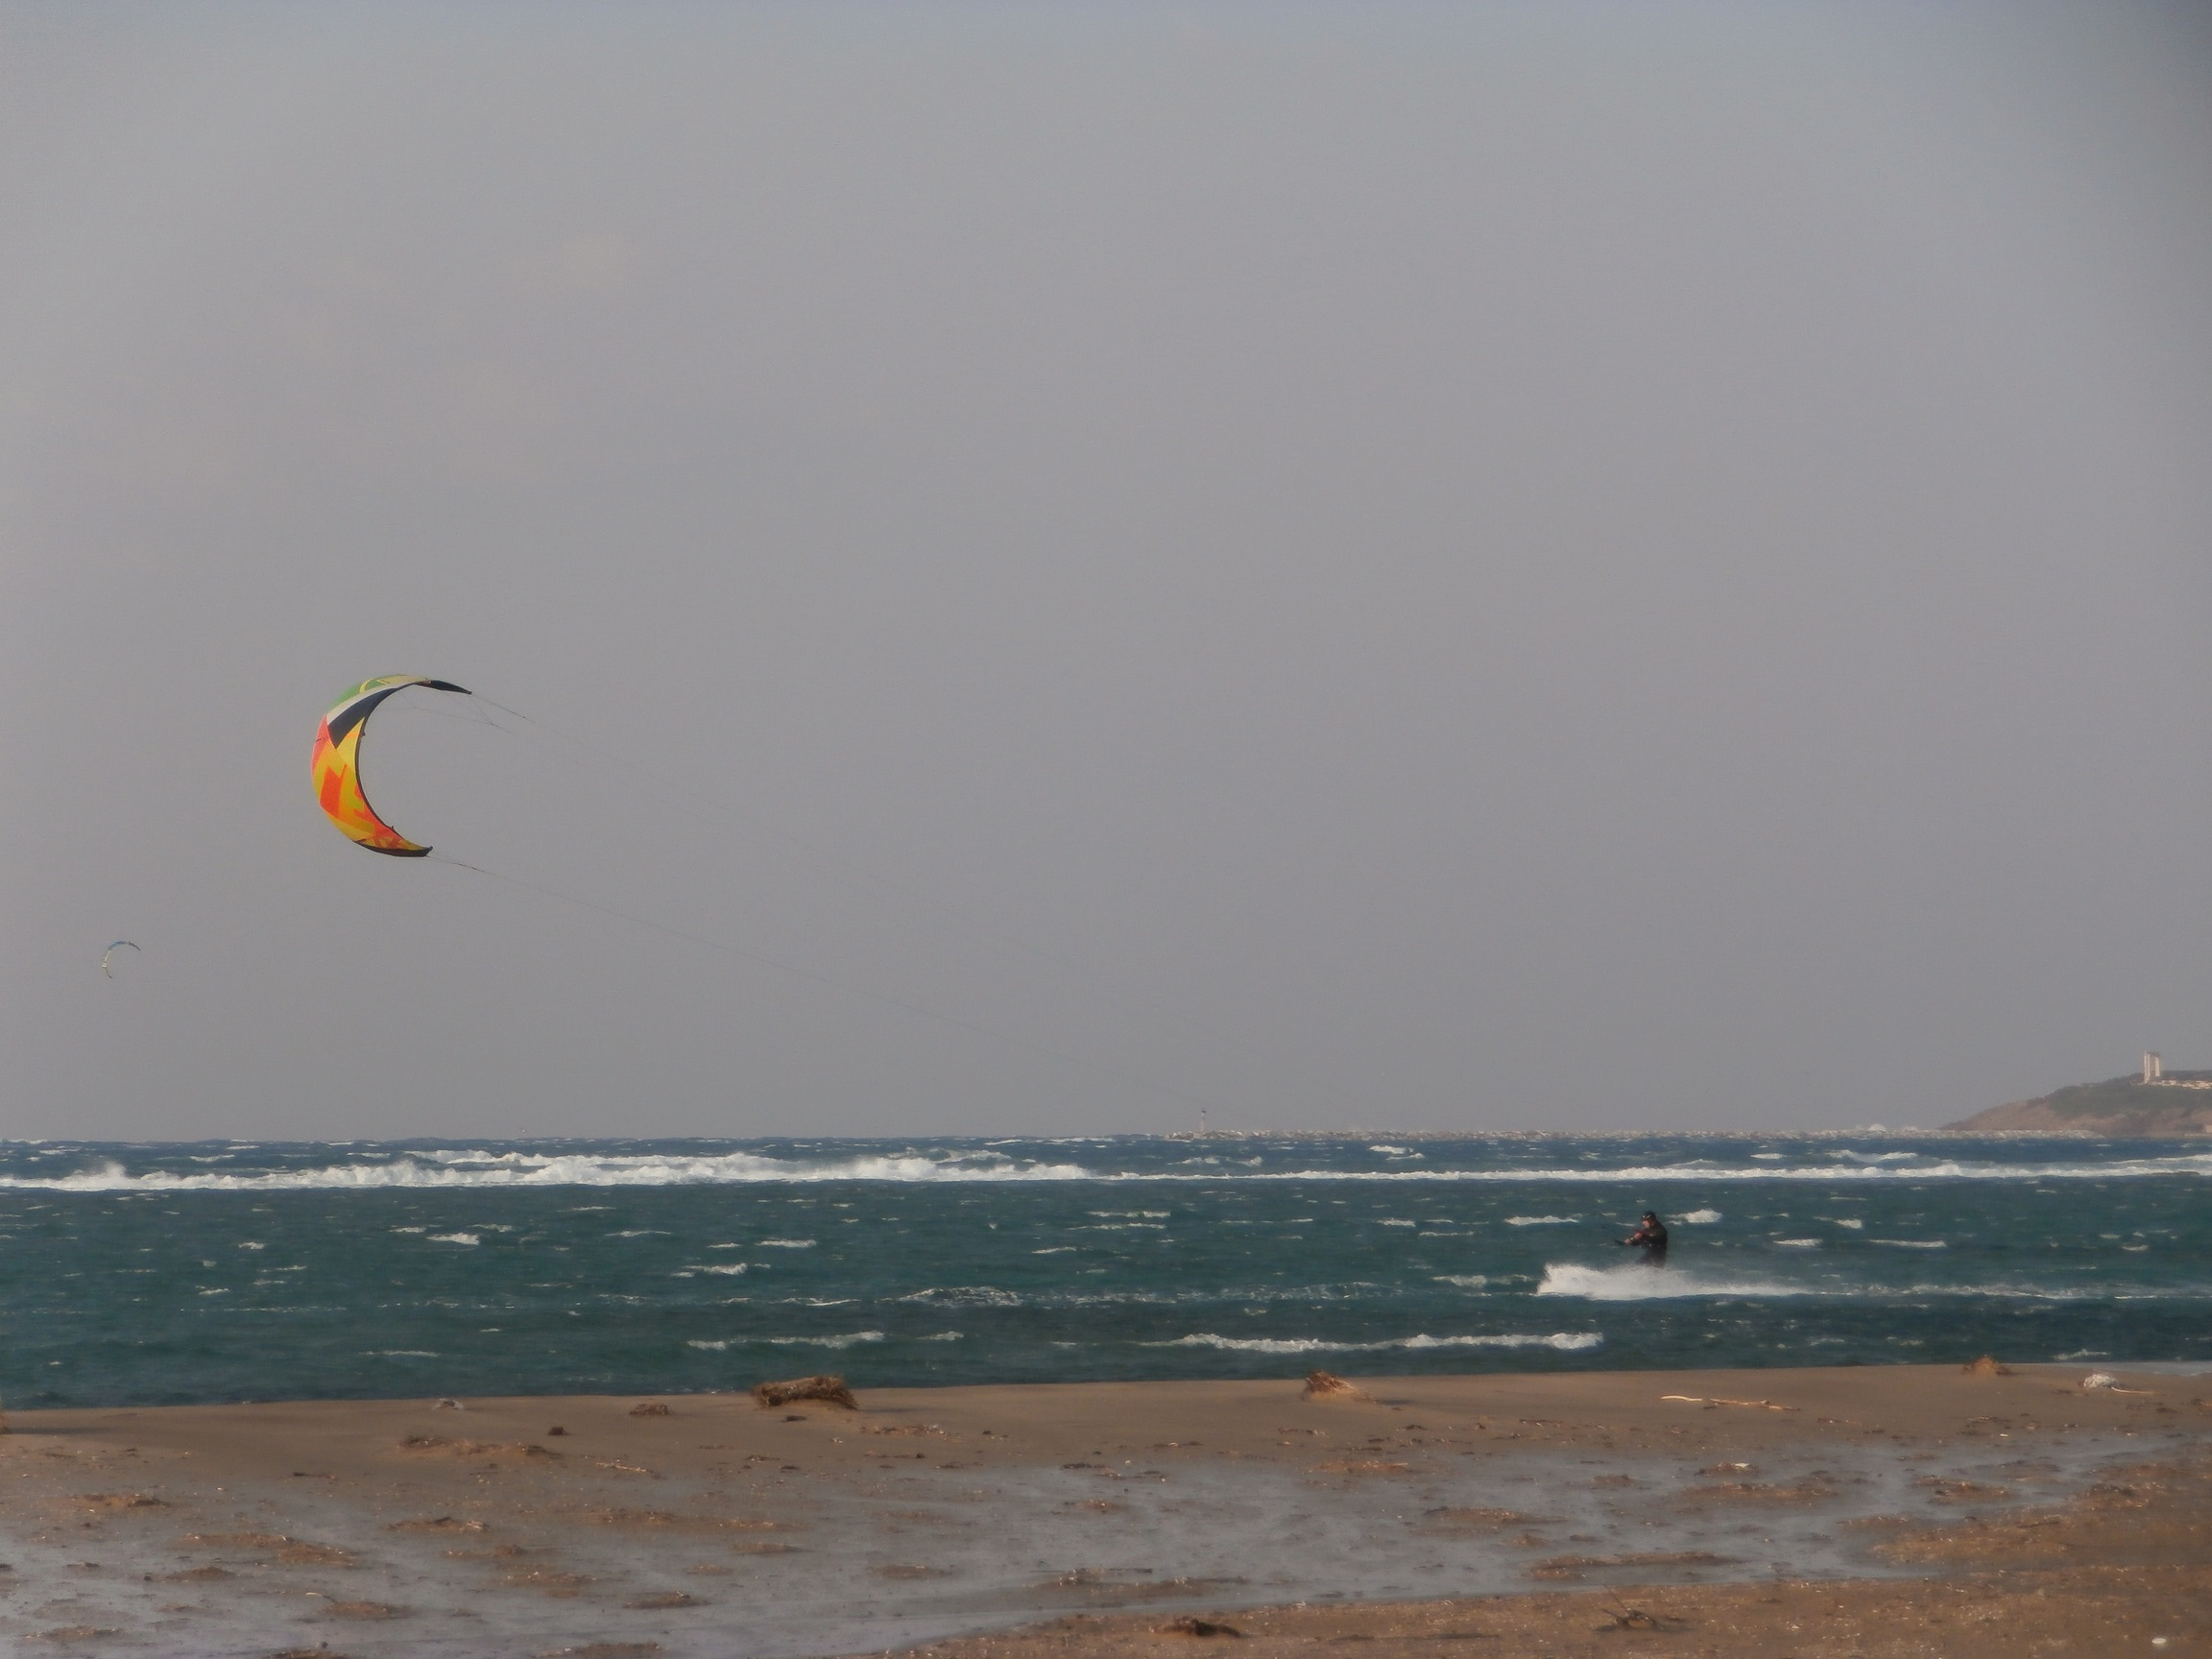 Kitesurfing in Laguna